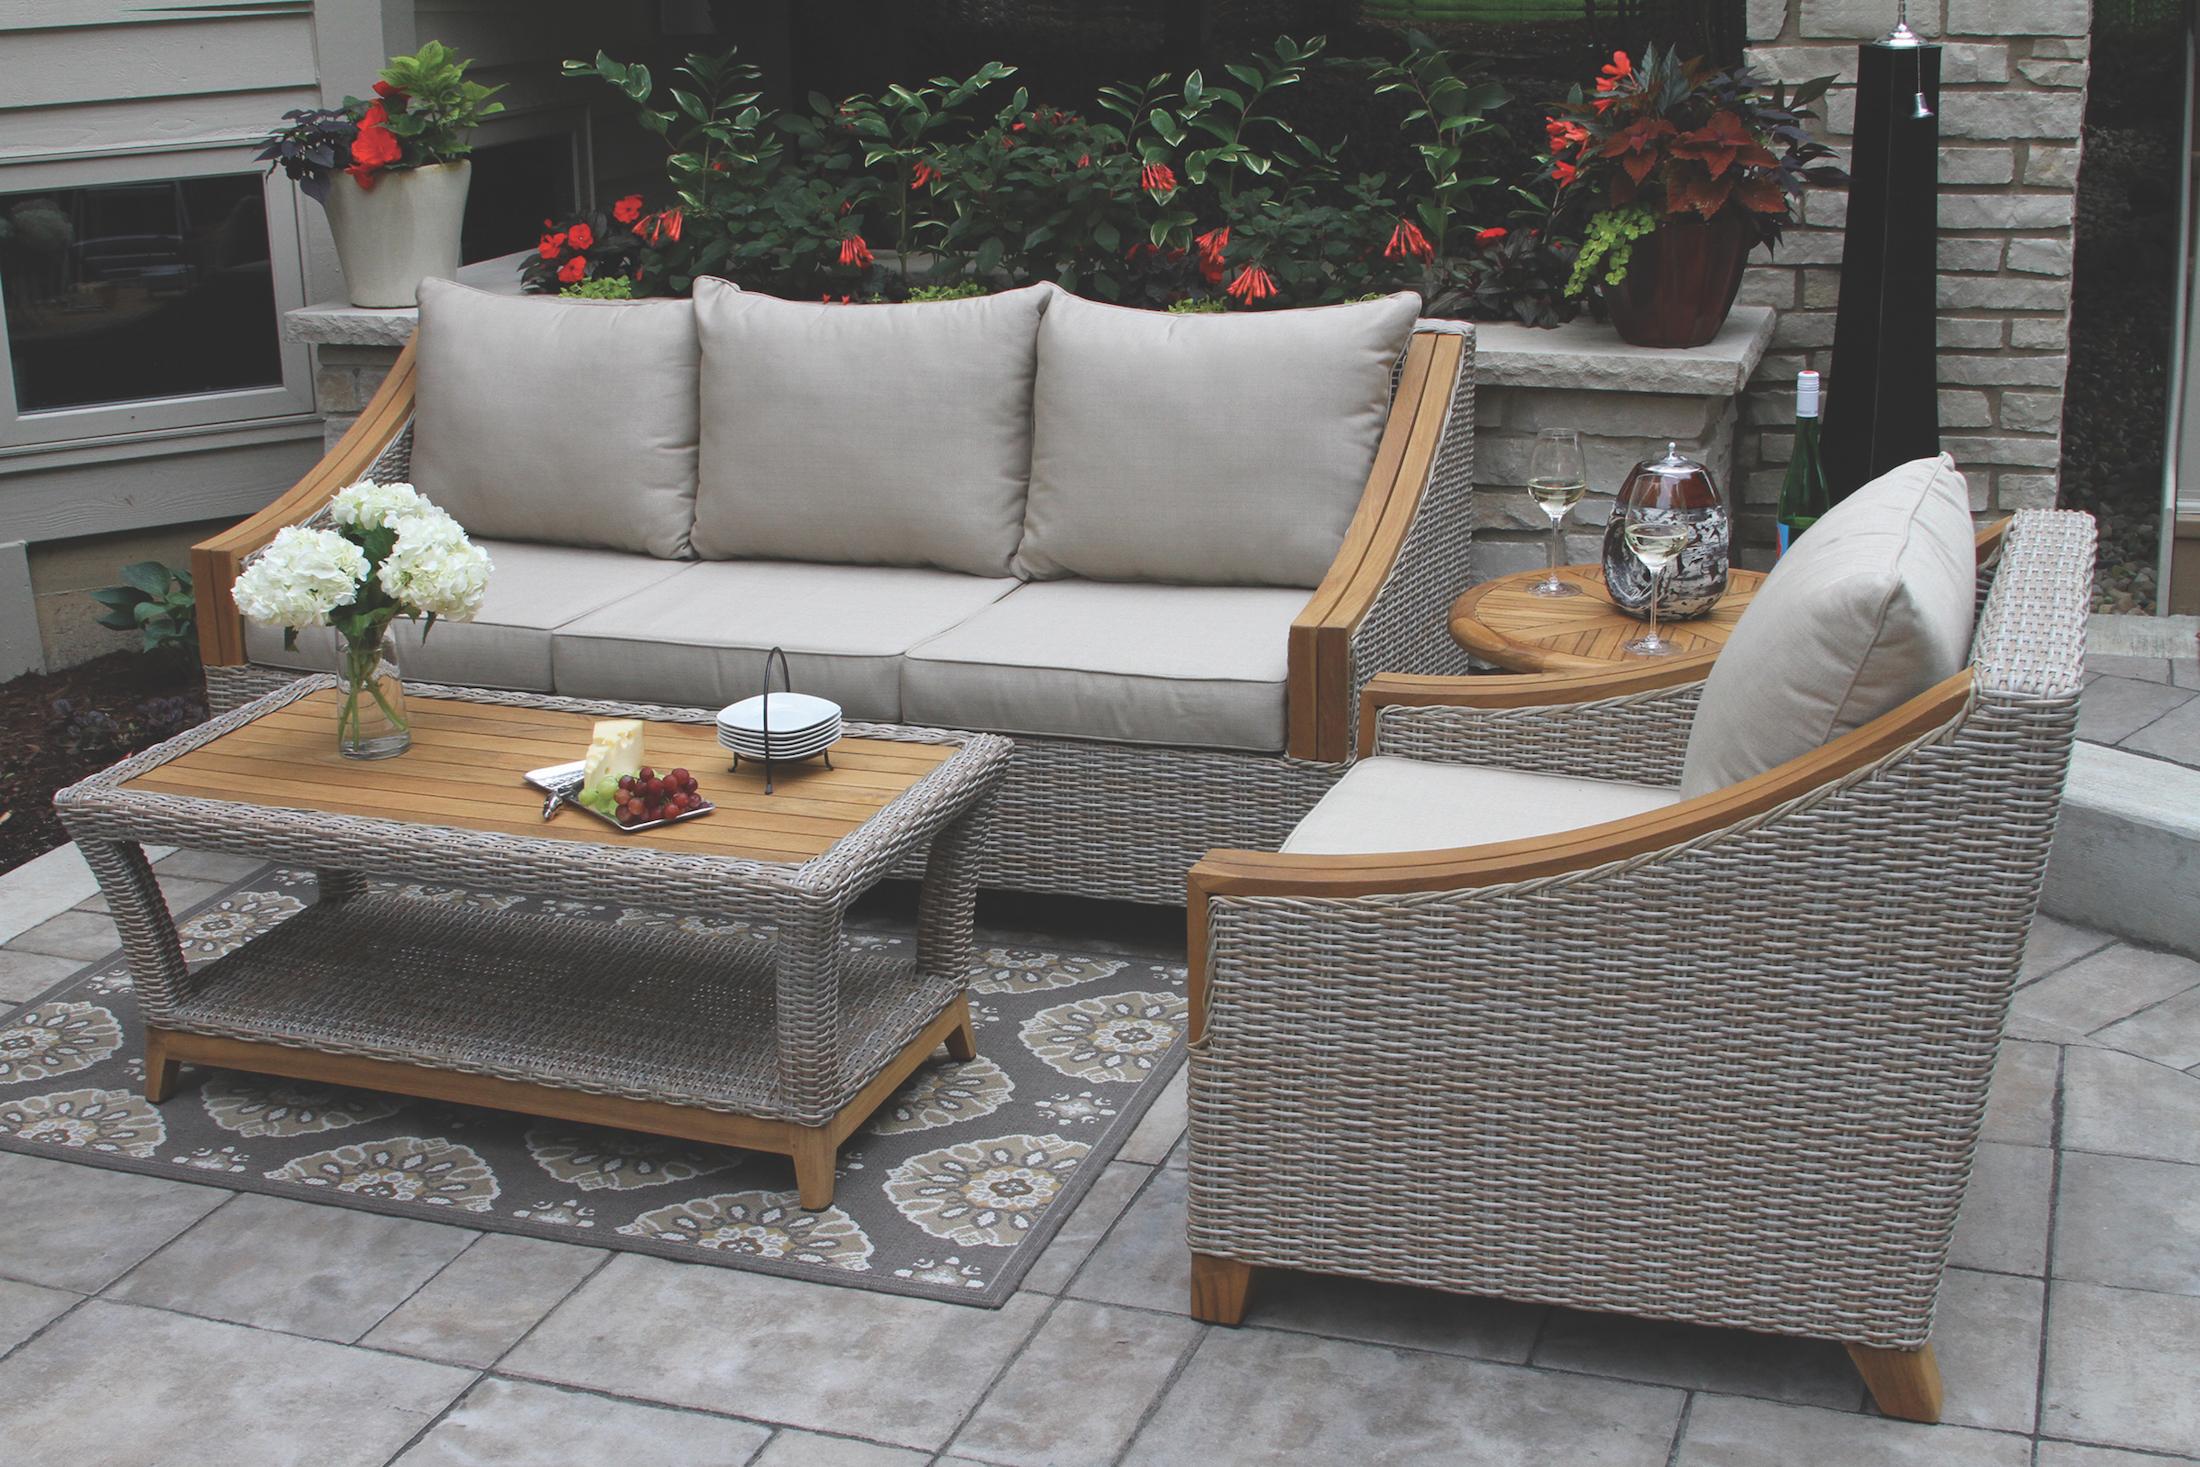 Wicker Amp Natural Teak Wood Sofa With Sunbrella Cushions